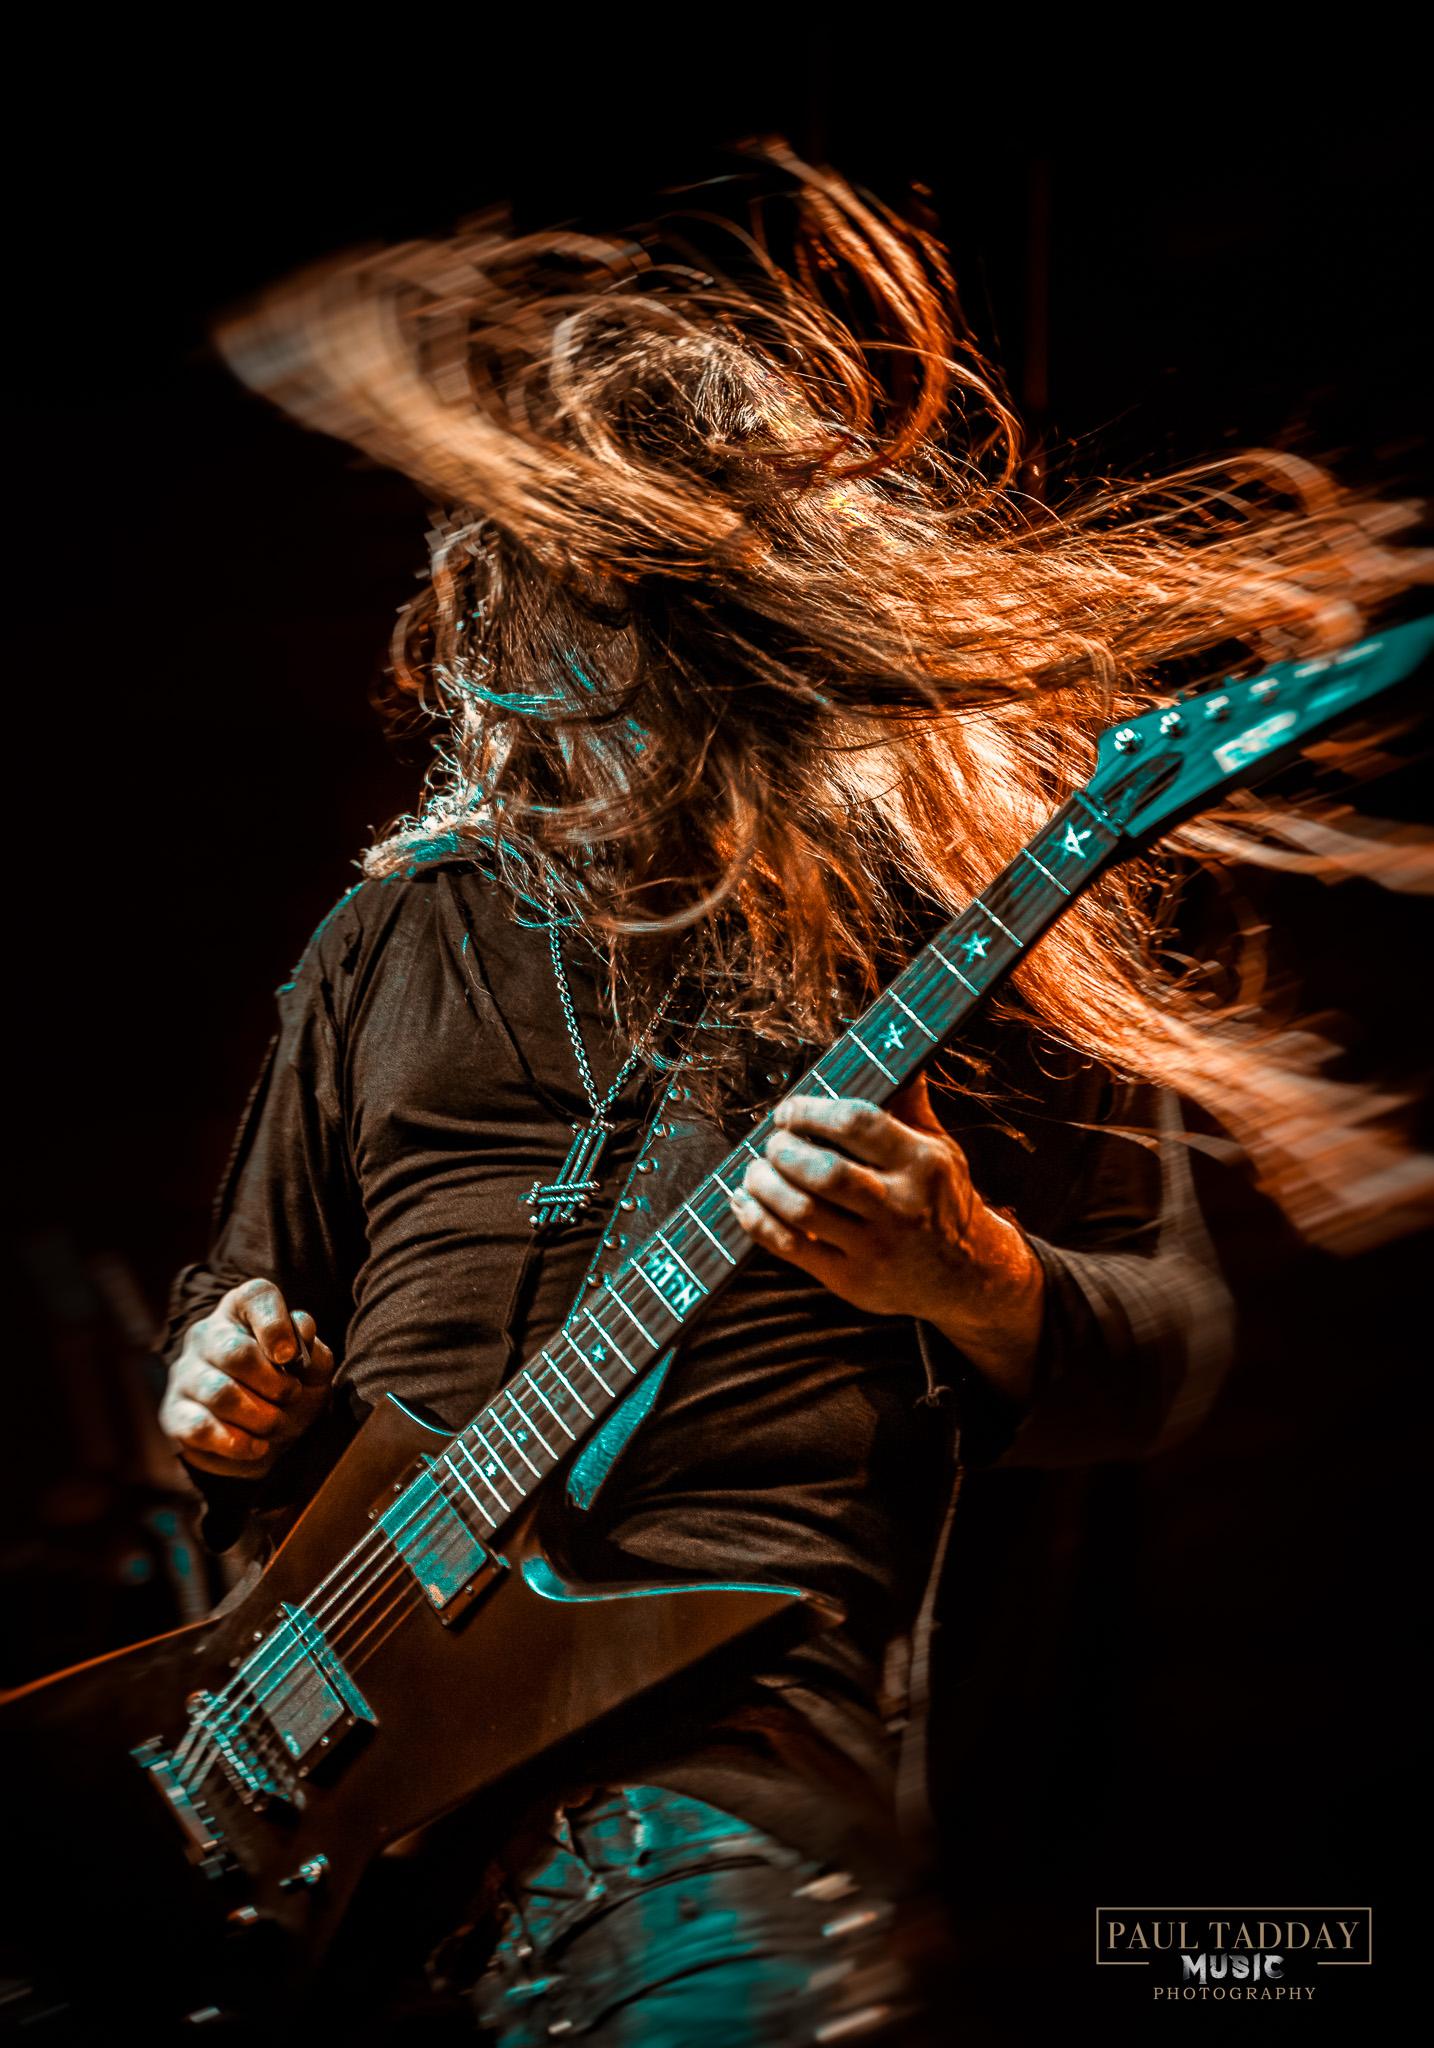 behemoth - brisbane - march 7 2019 - web - paul tadday photography - 34.jpg